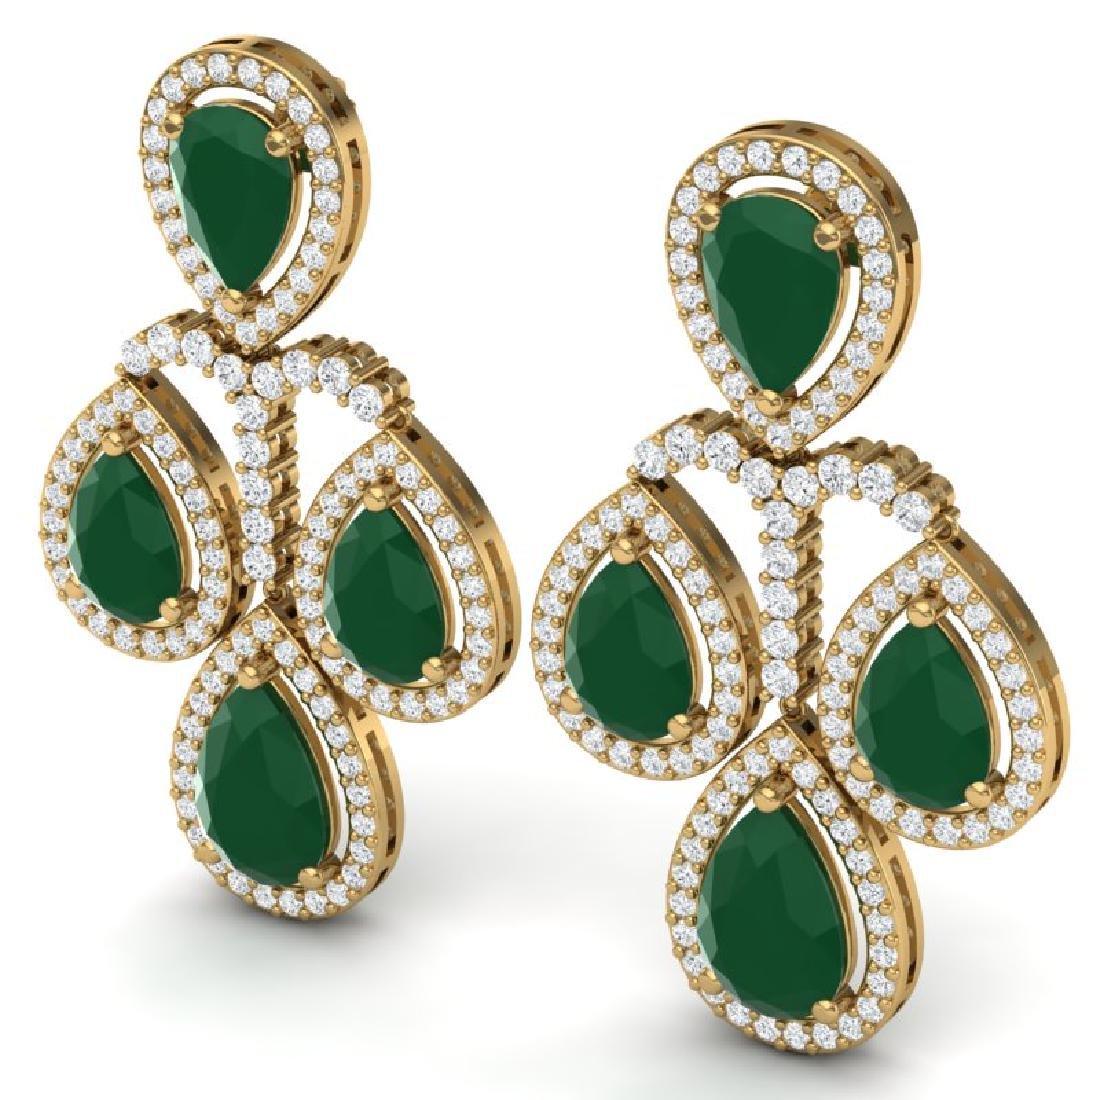 29.23 CTW Royalty Emerald & VS Diamond Earrings 18K - 2